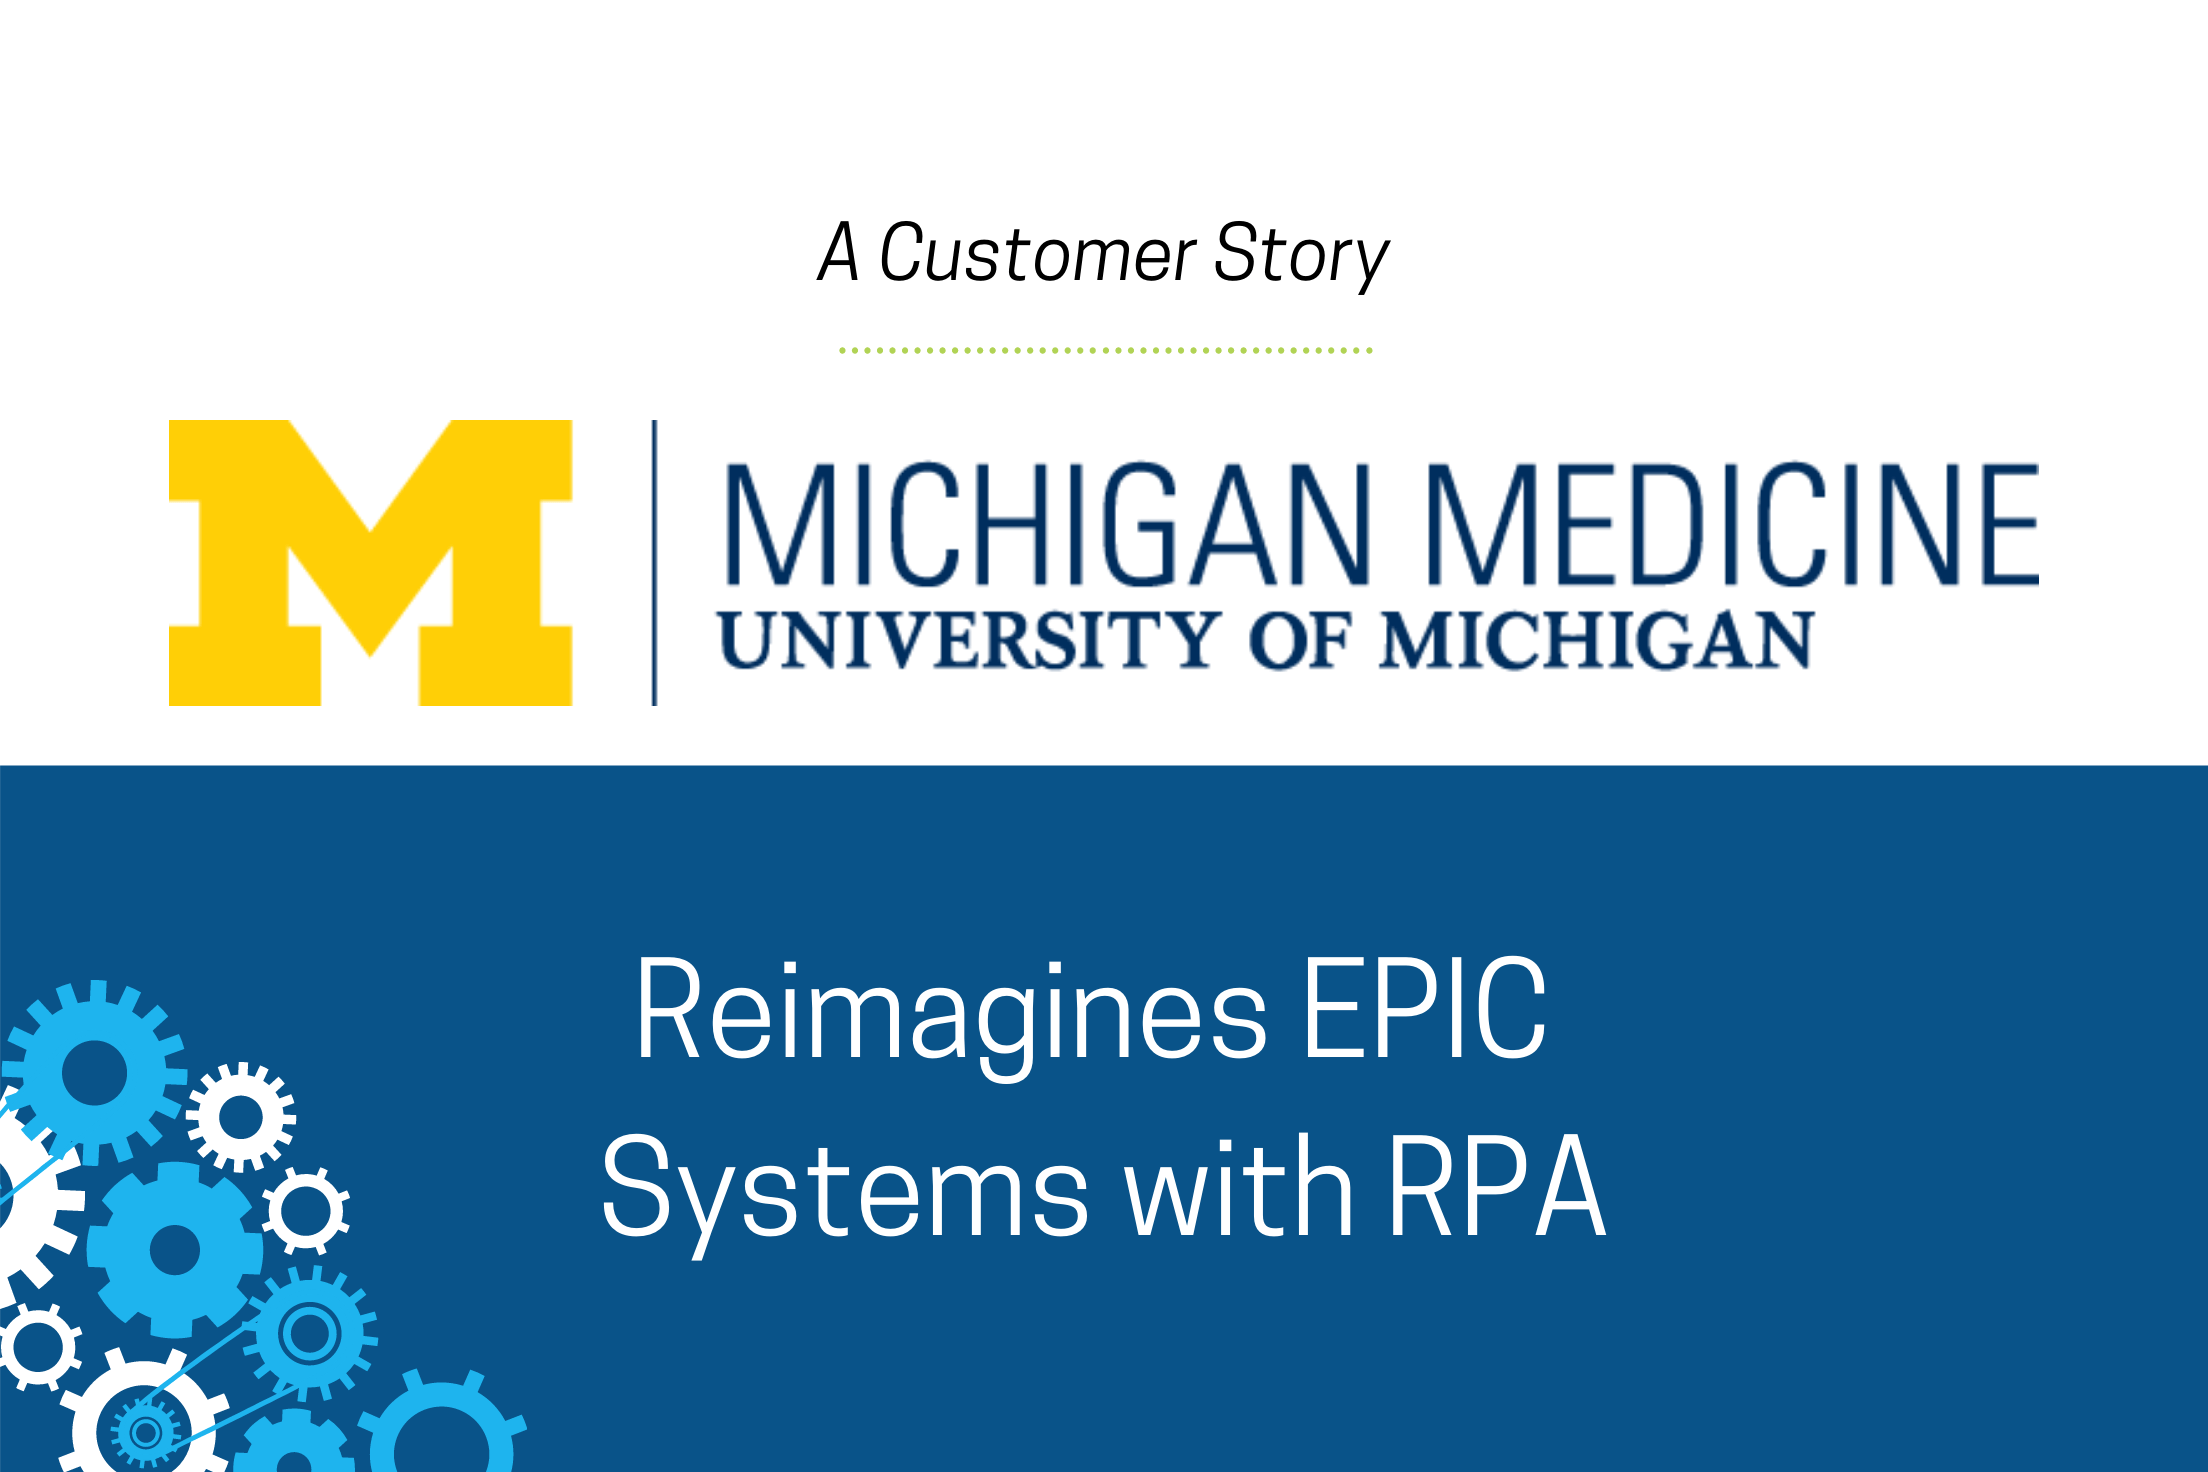 RPA Case Study - Michigan Medicine